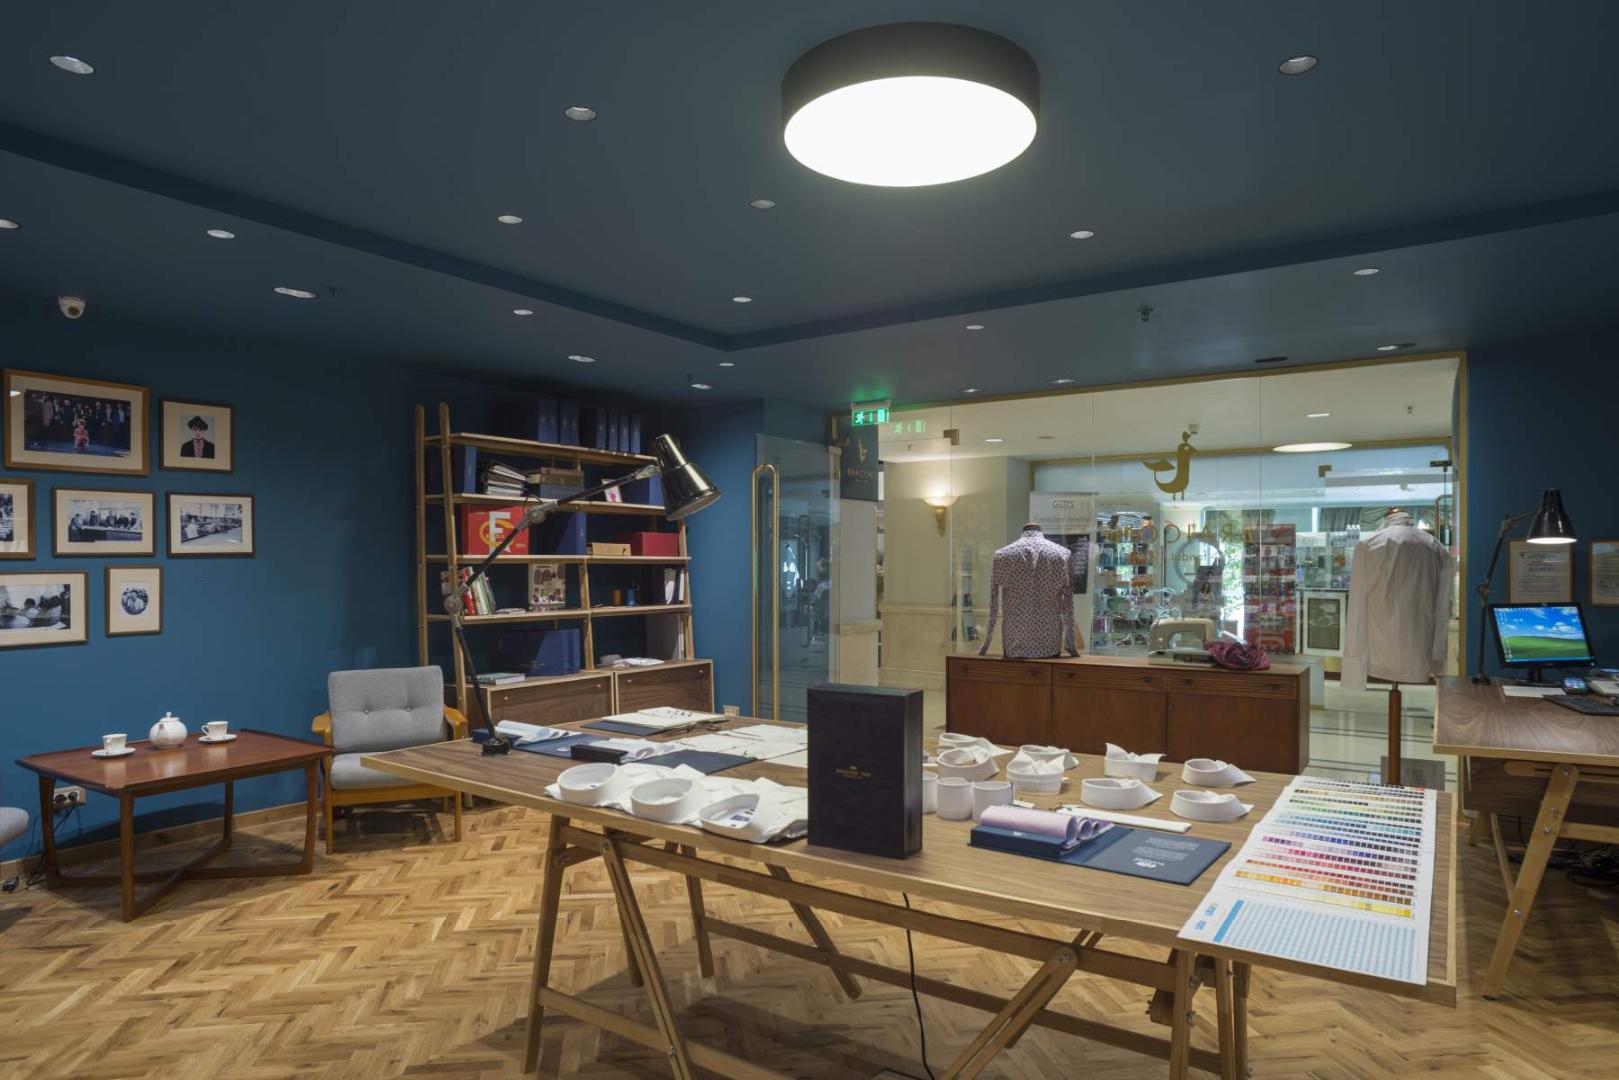 Braiconf magazin shop marriott mobilier lemn masiv furnir design dinamic011